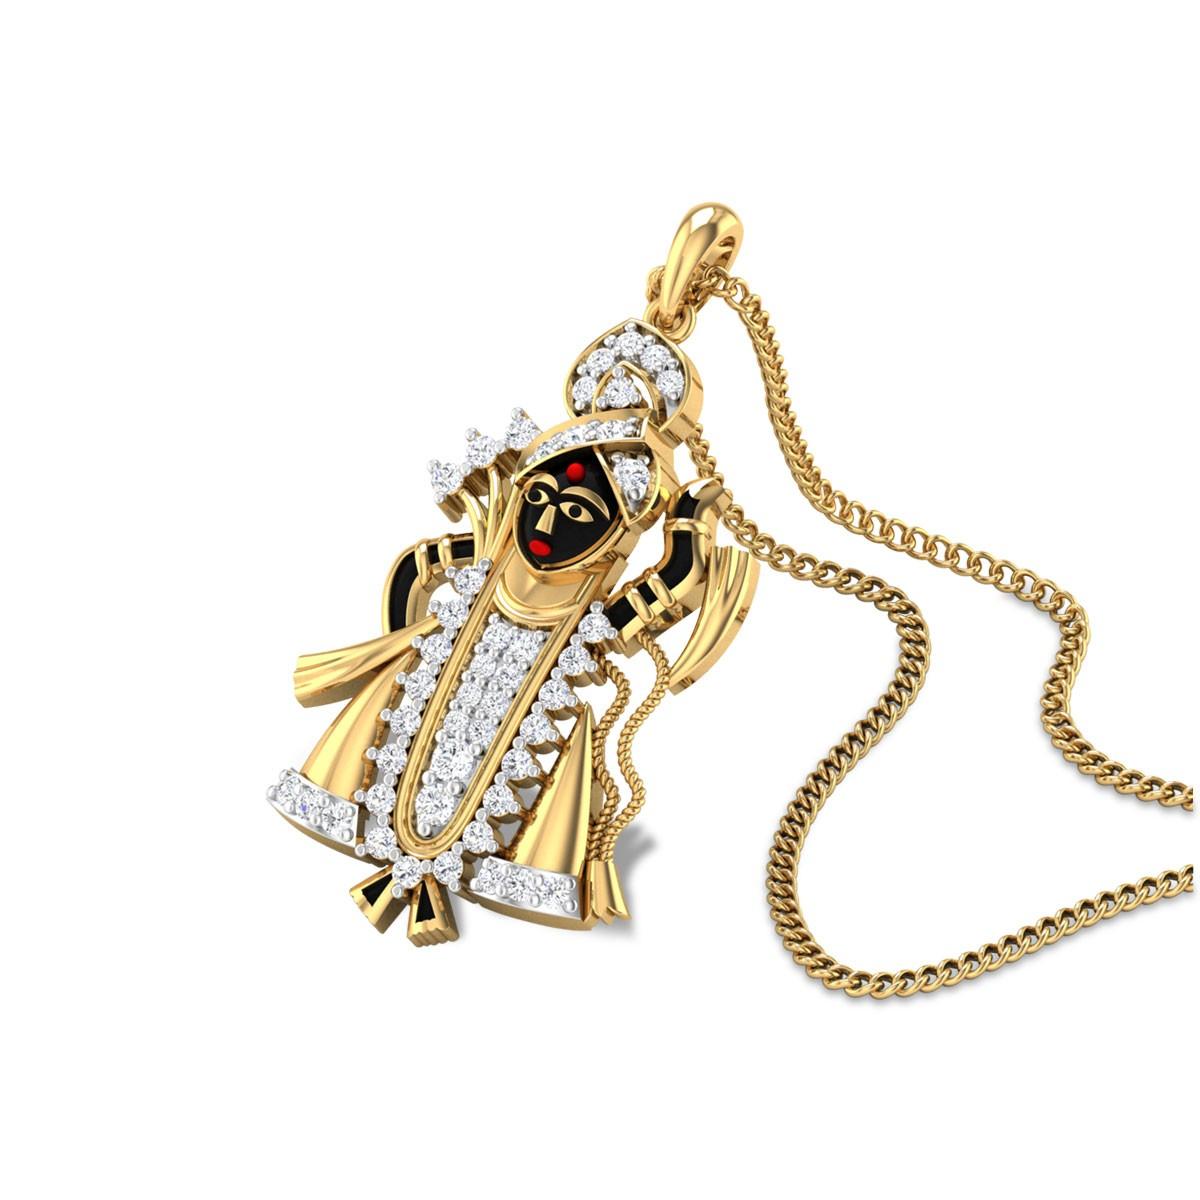 Srinathji Diamond Pendant